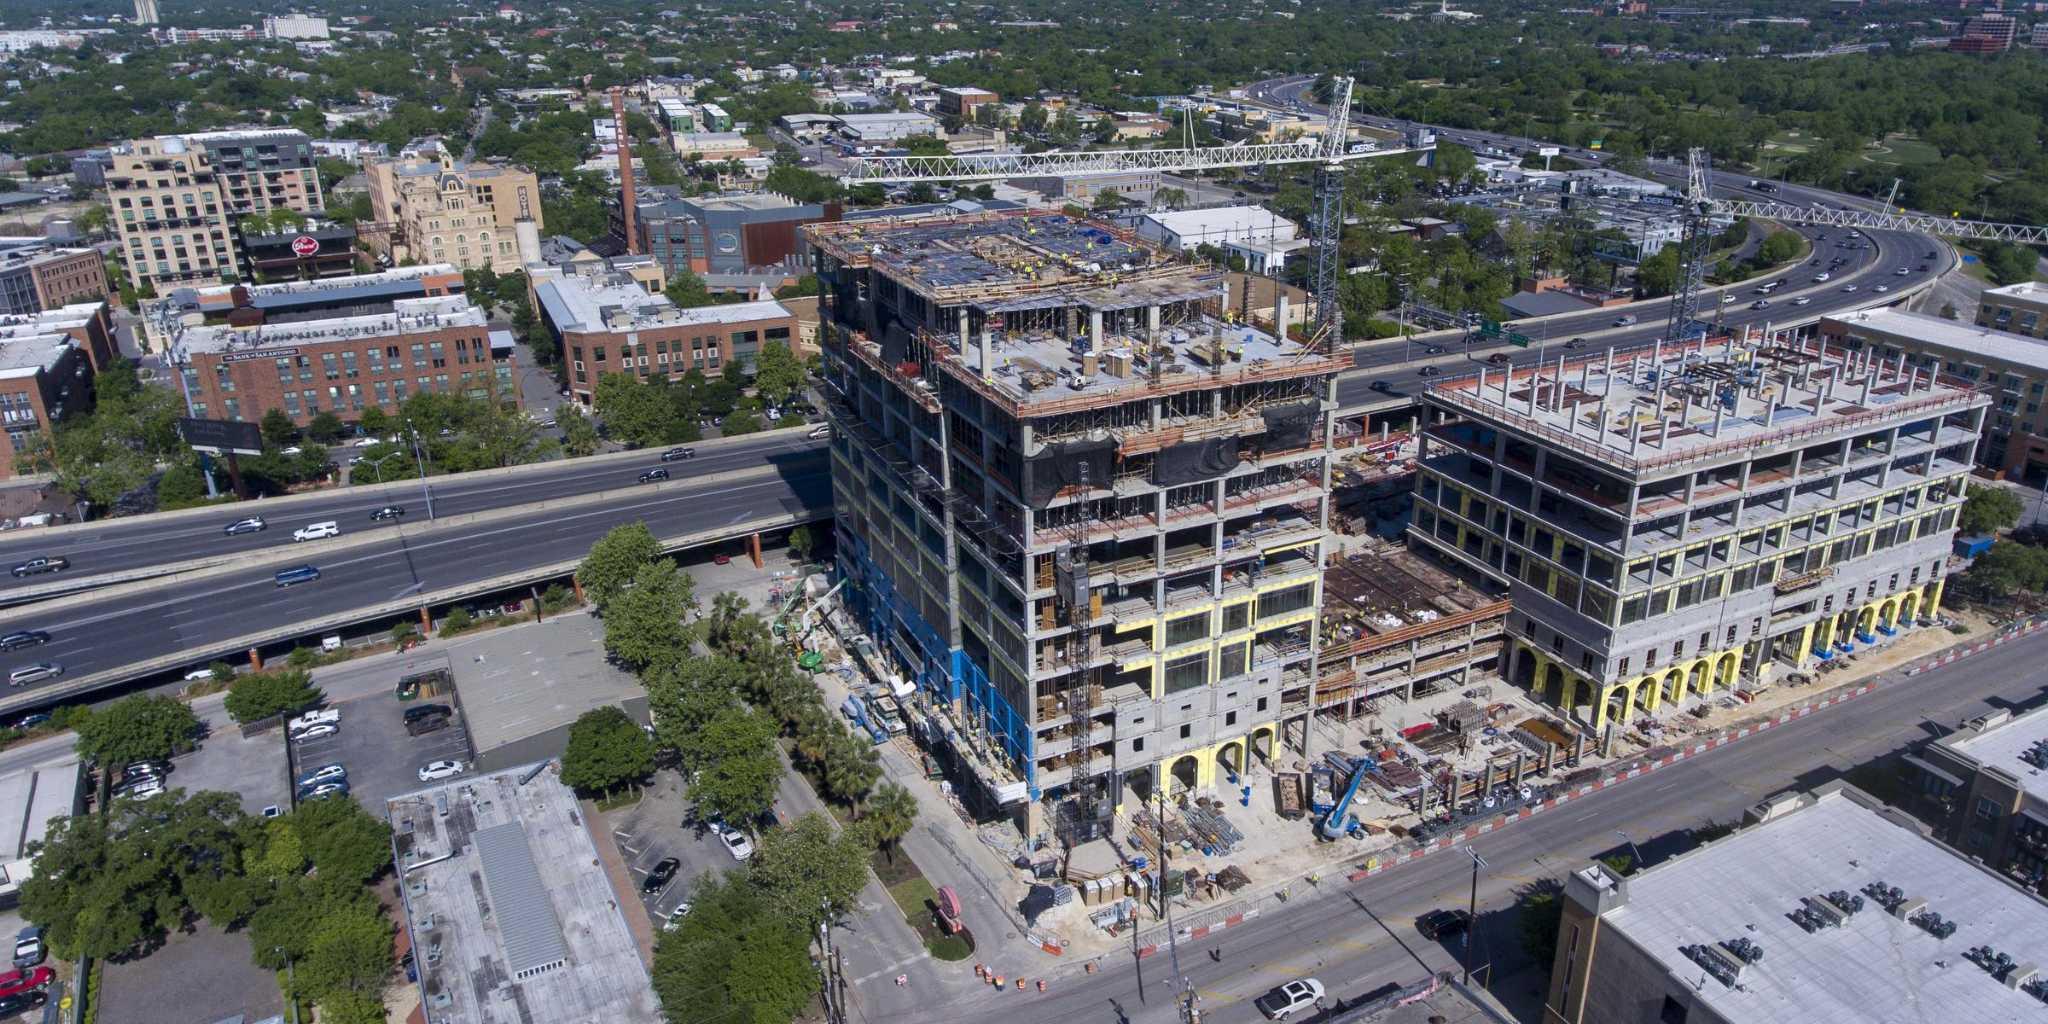 Progressive stronghold embodies San Antonio's political divide